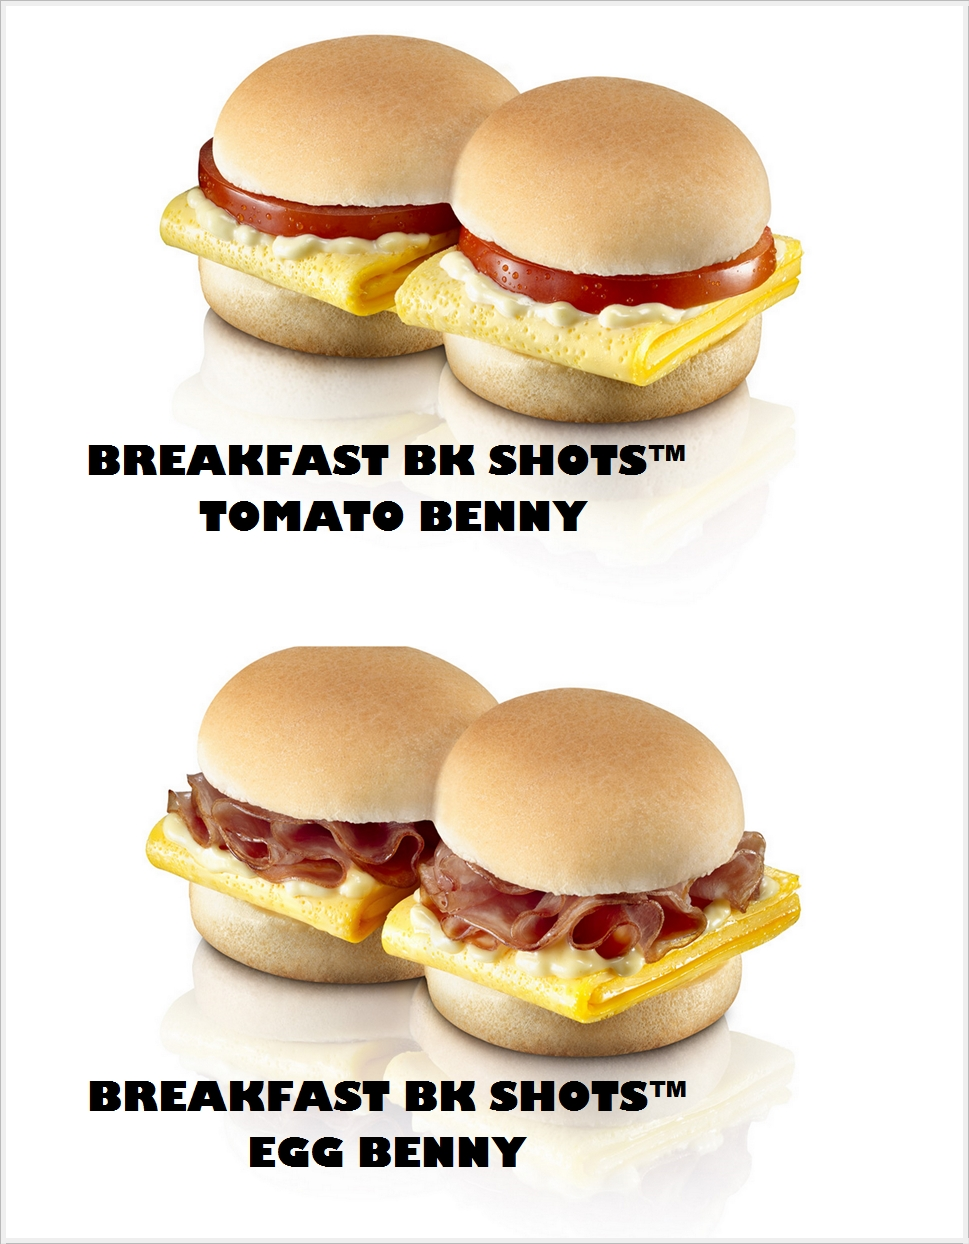 Tasty Breakfast Choices Burger King